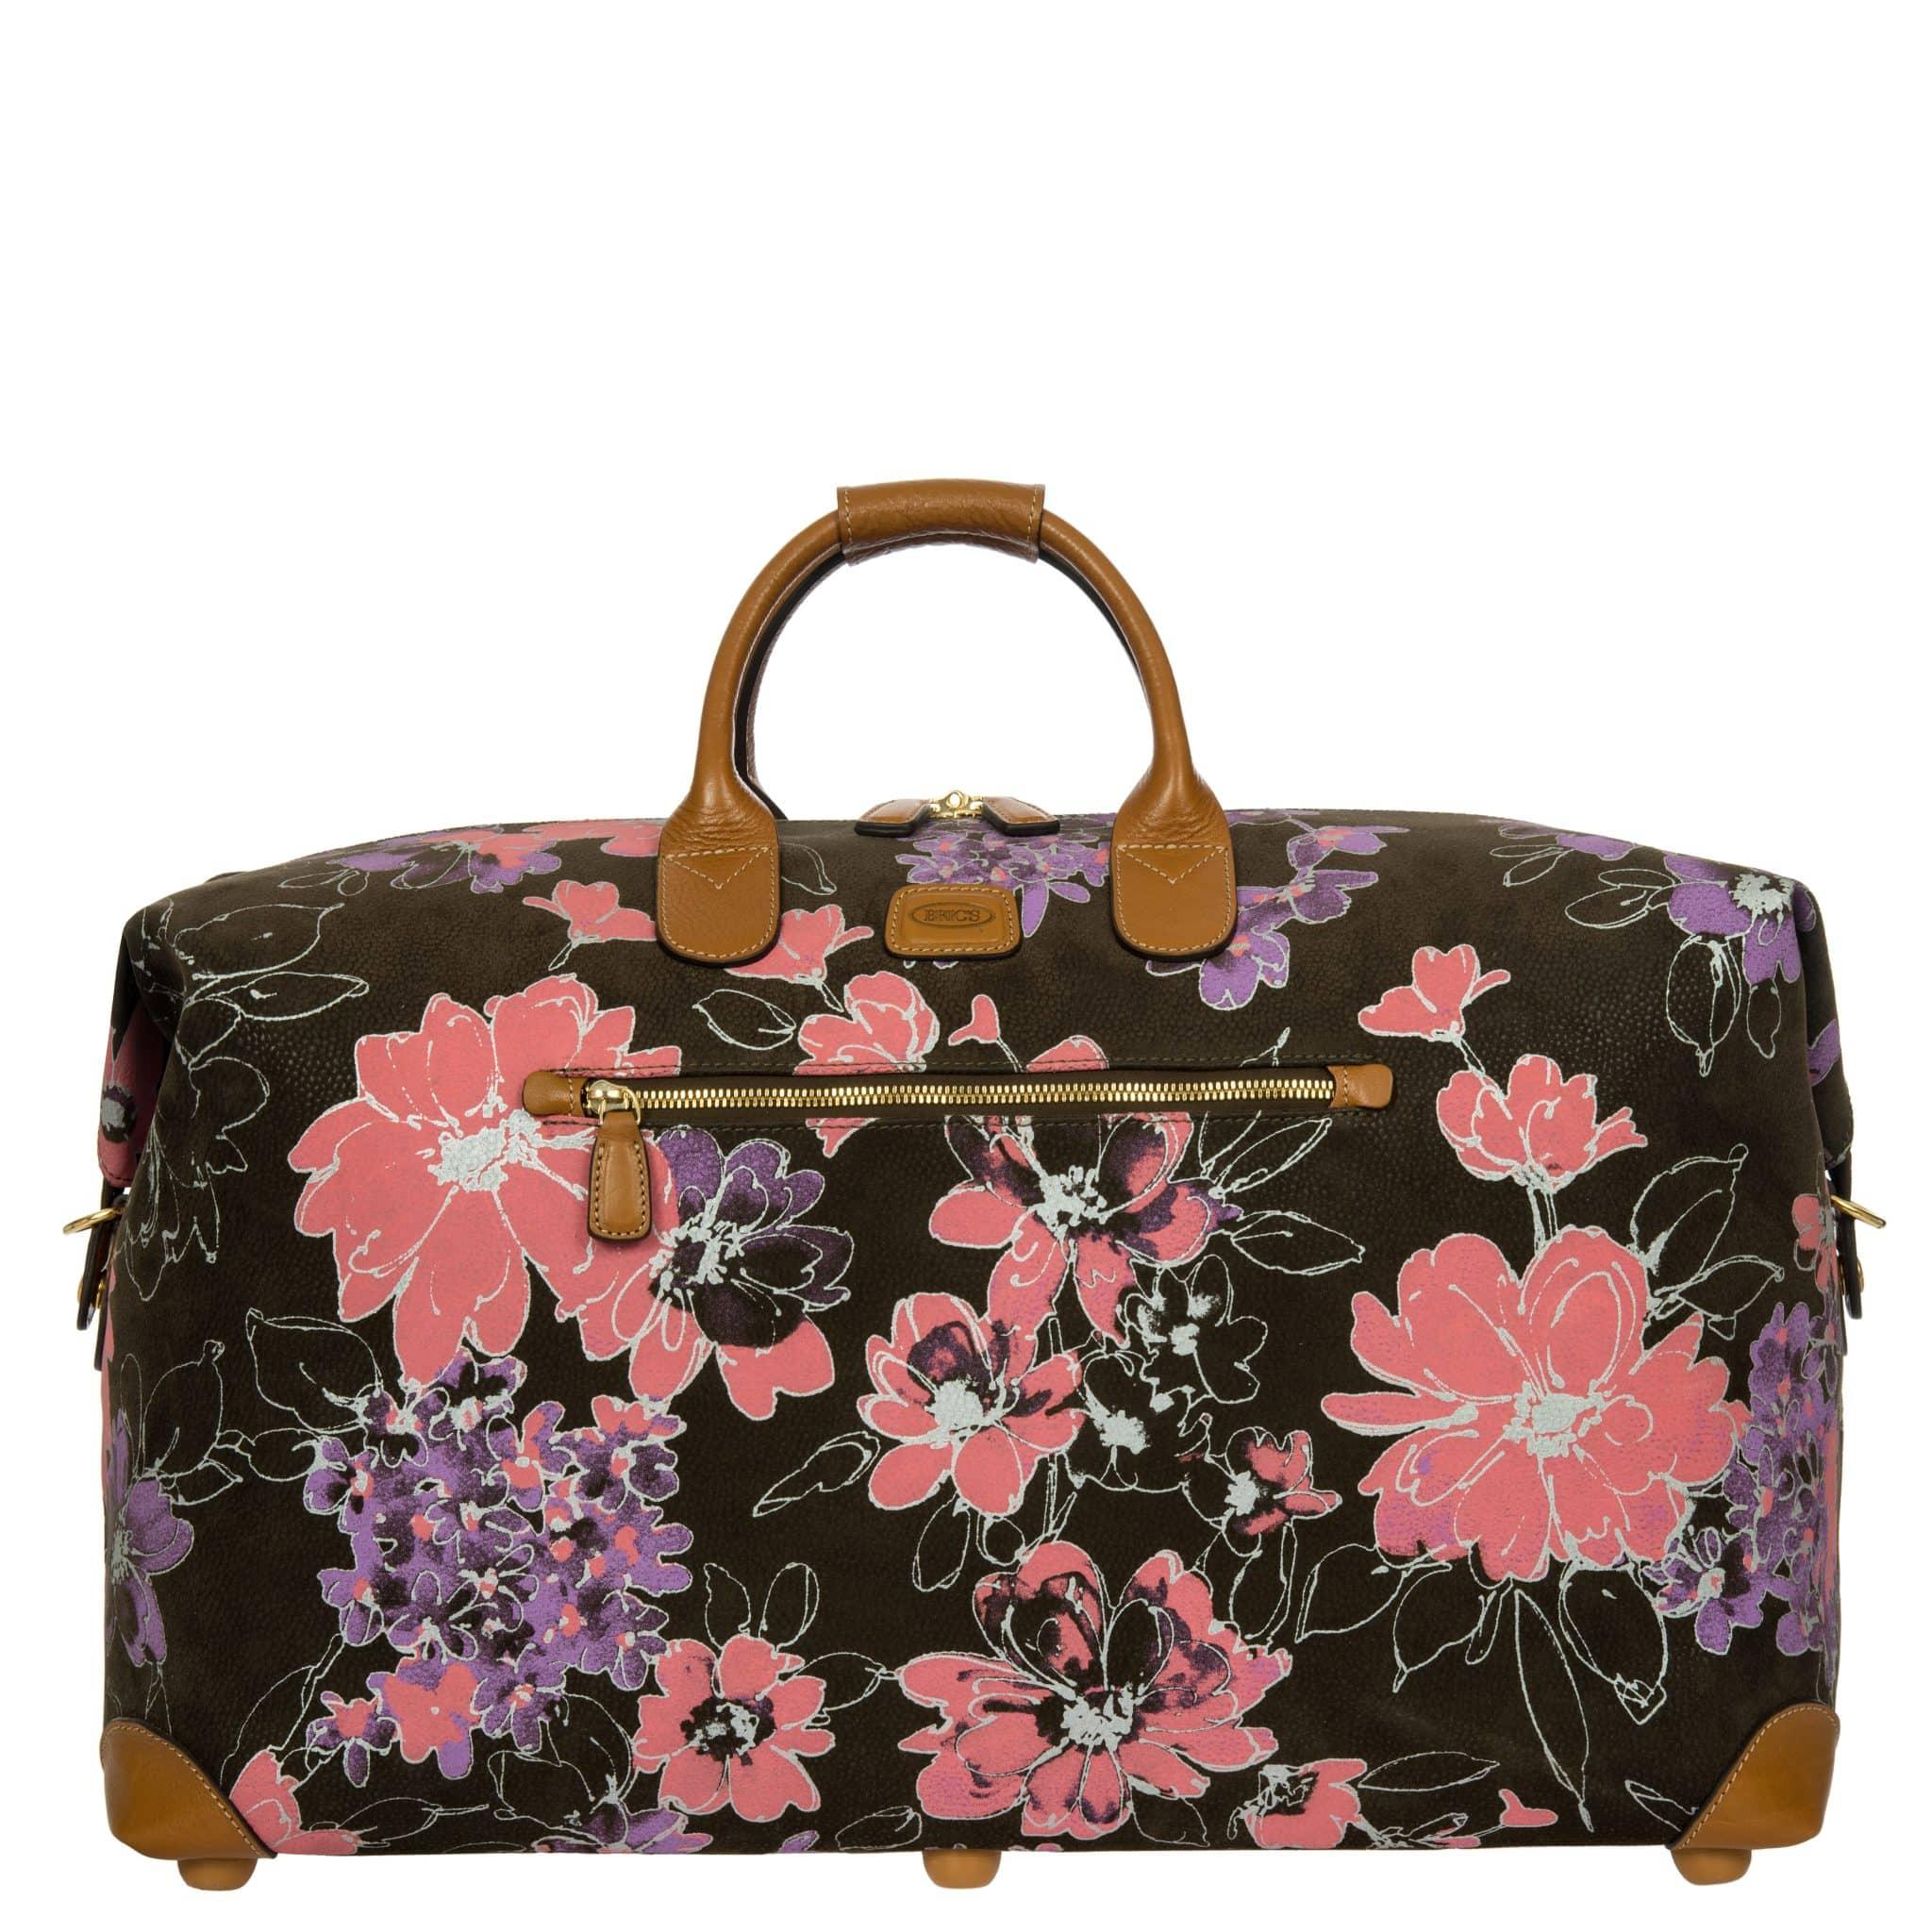 Túi du lịch nữ Life 65 Holdall B6530203.023